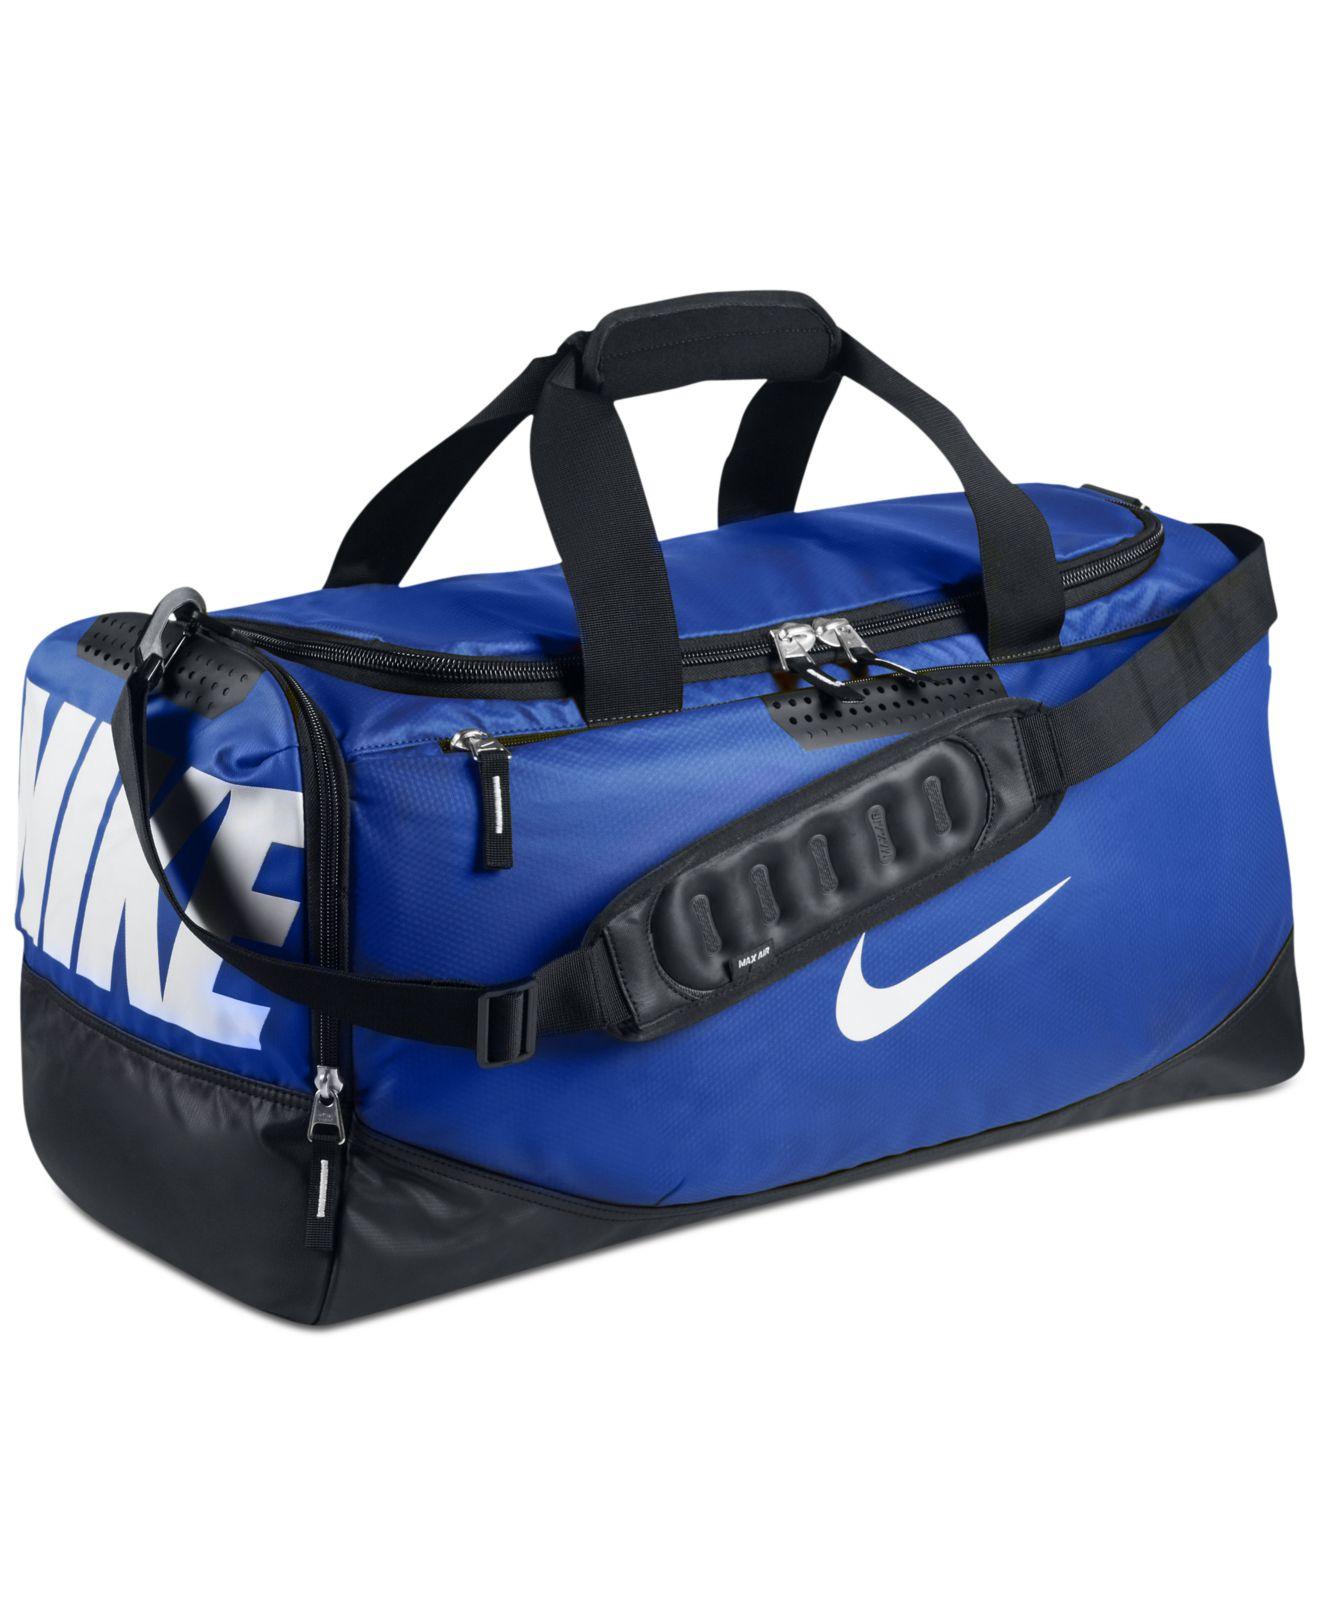 651ba8c759 Lyst - Nike Water Resistant Team Training Medium Duffle Bag in Blue ...